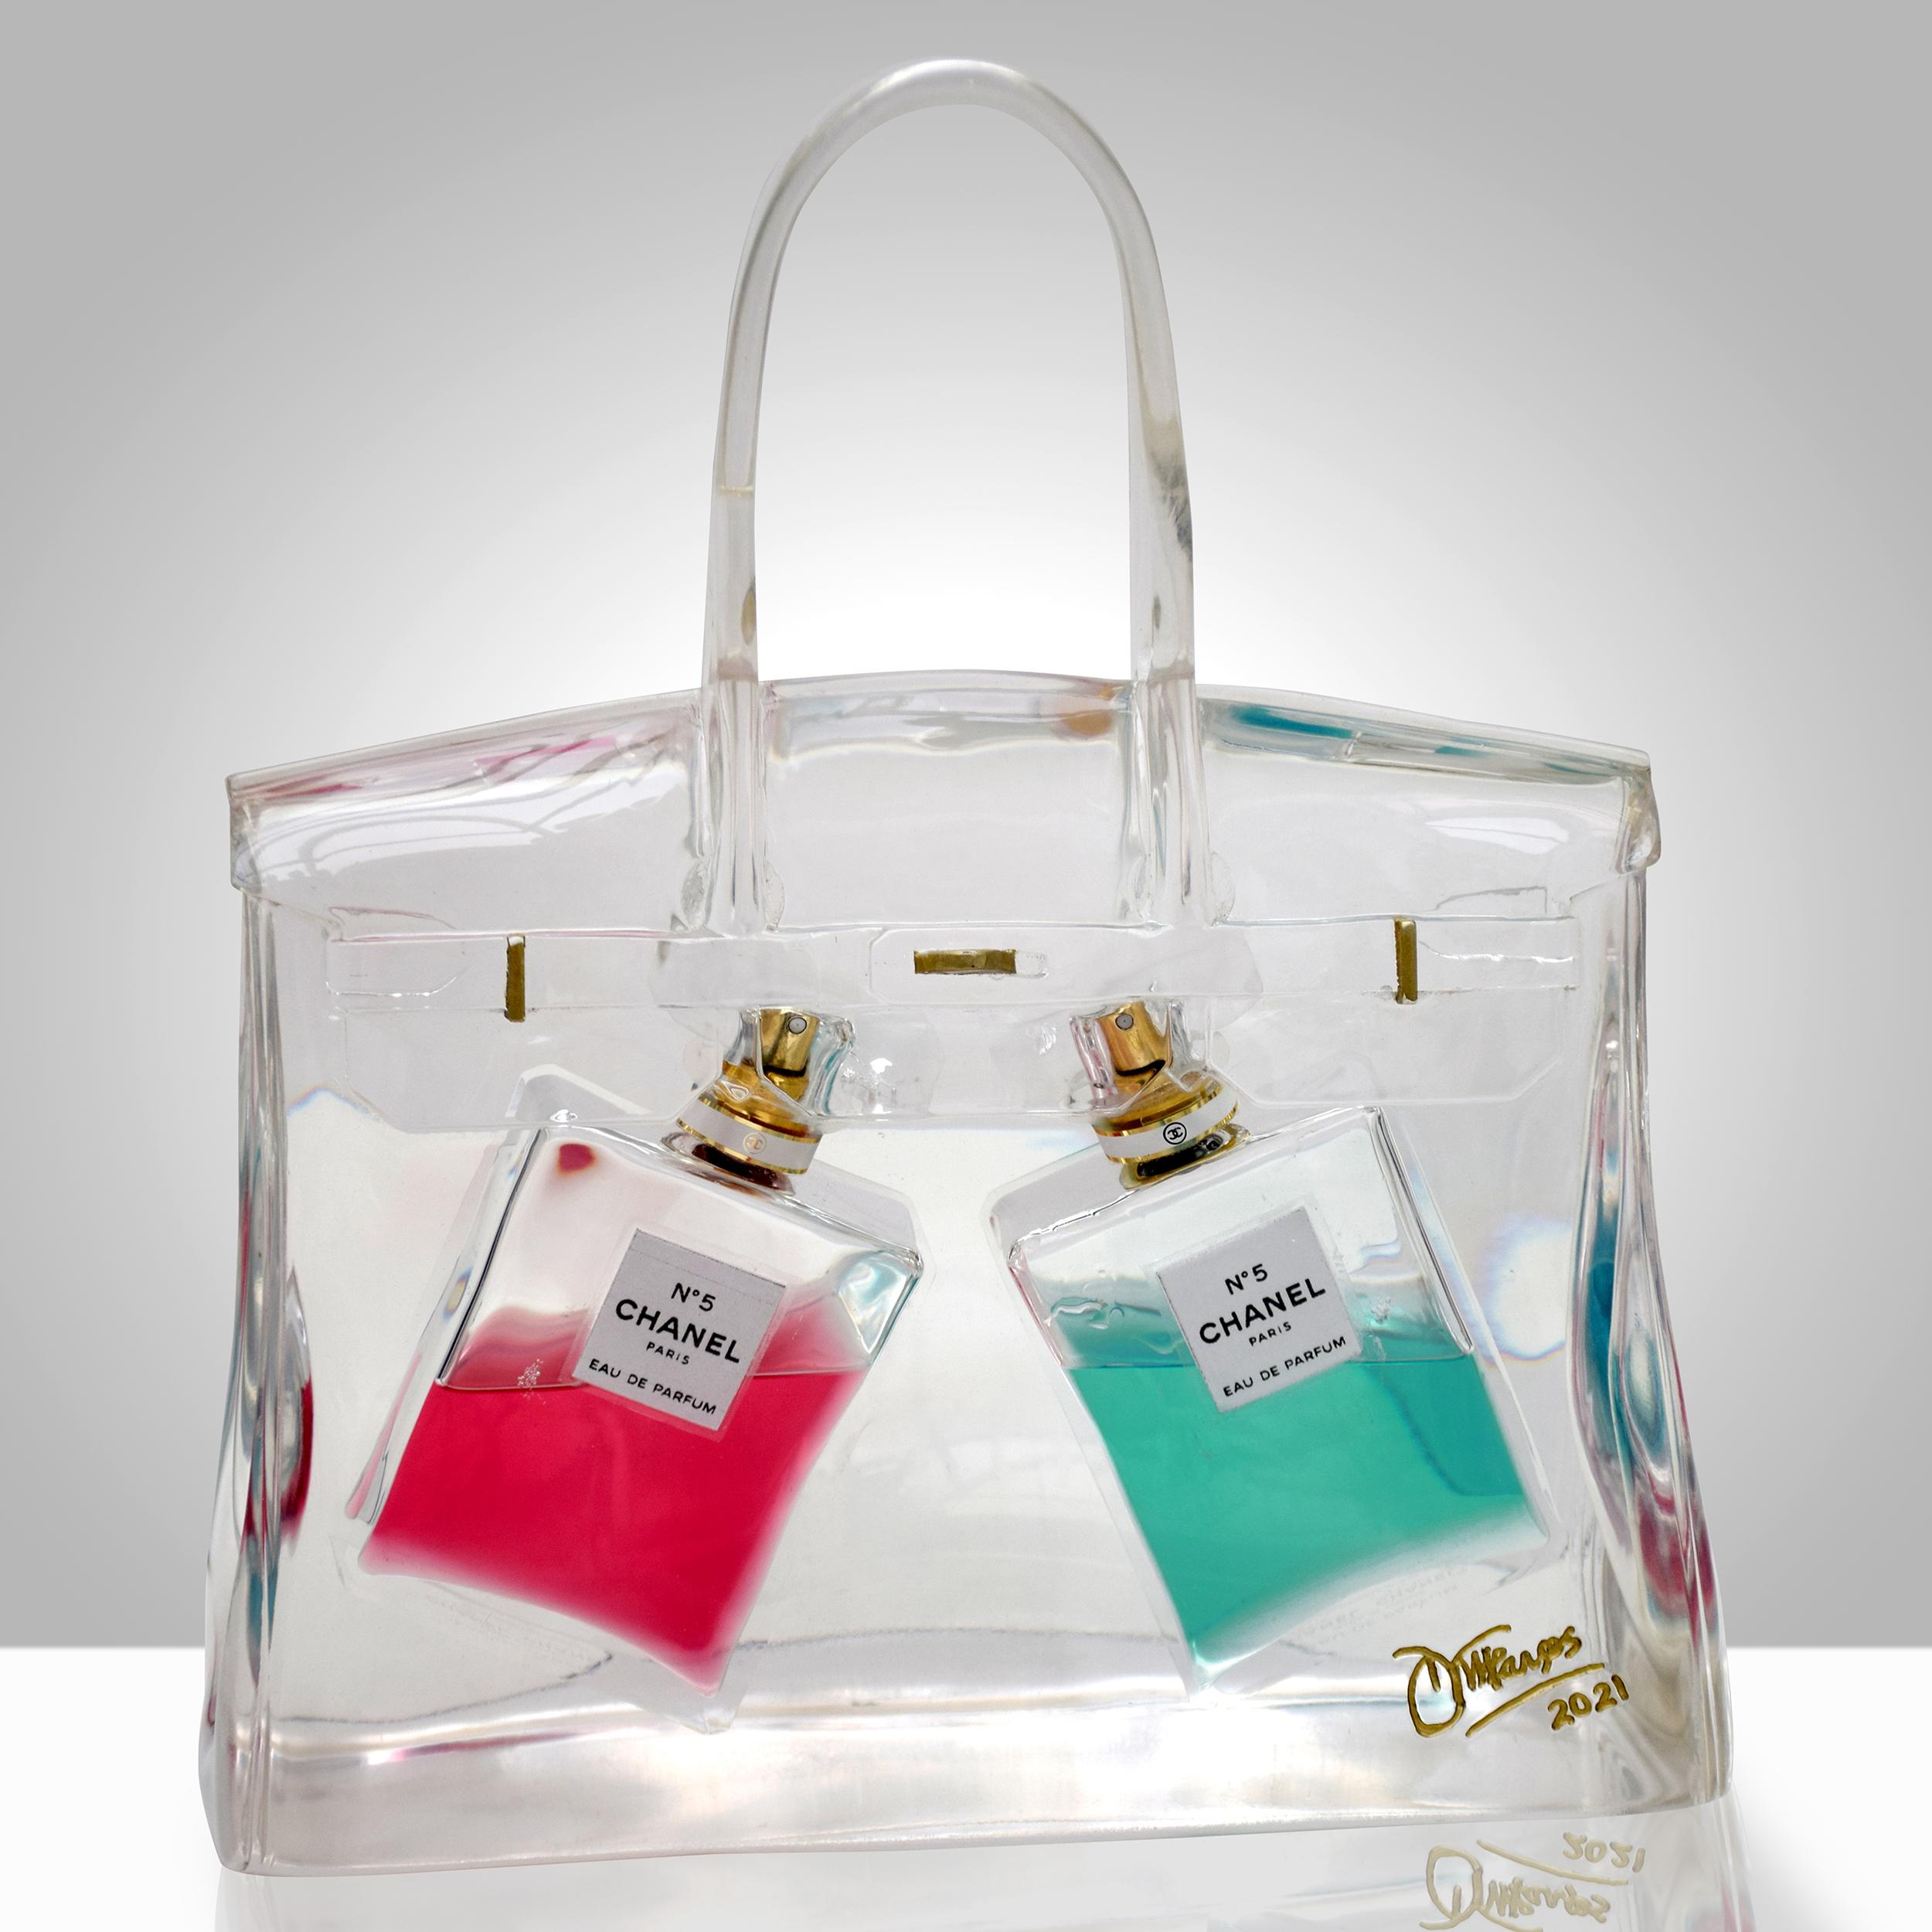 Debra Franses - Chanel Perfumes in HERMÈS Bag , 4509-011-013